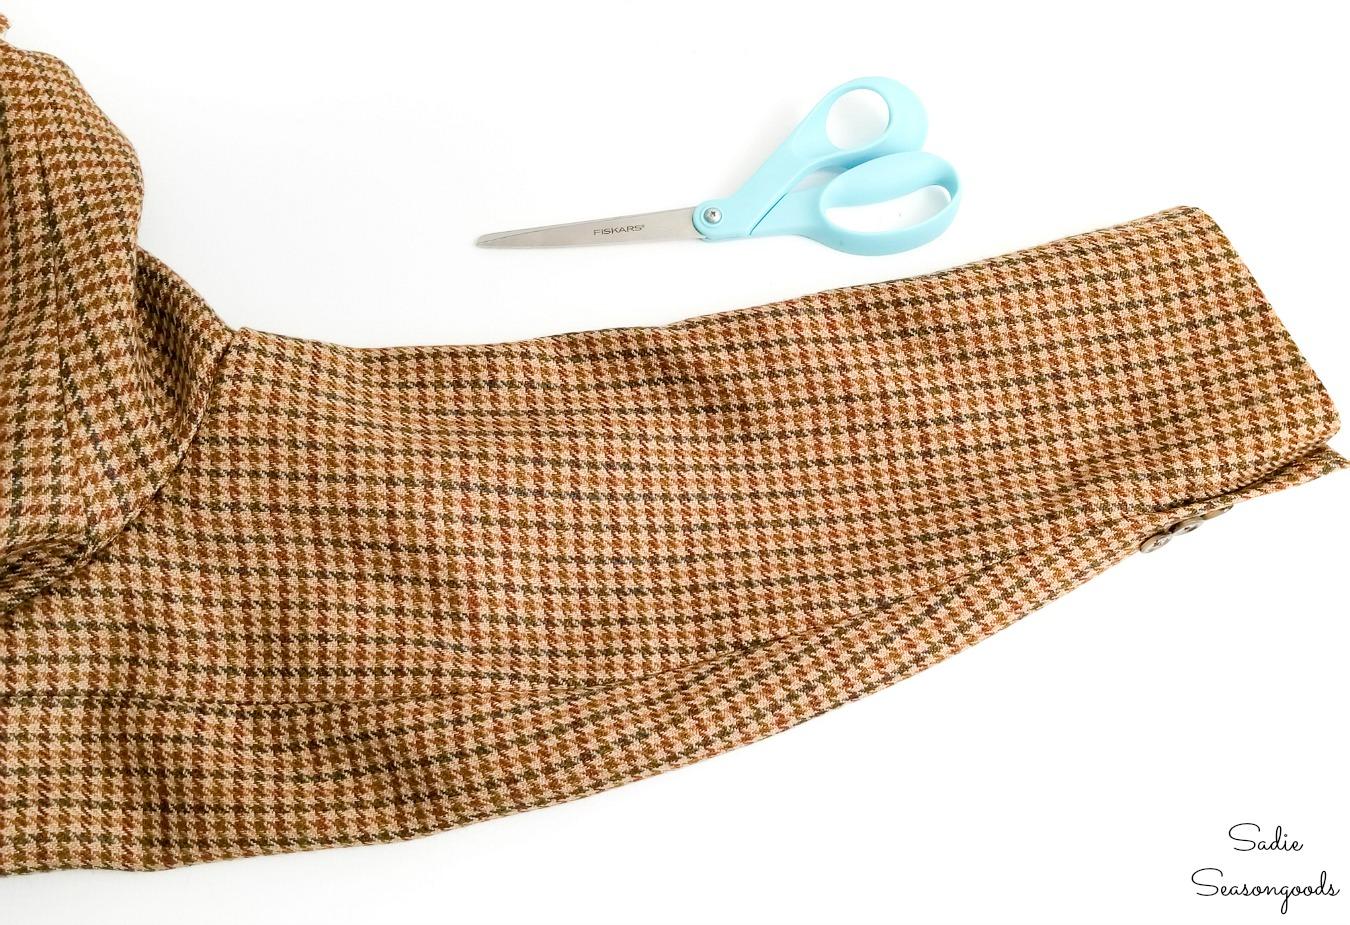 Sleeve of a tweed sport coat